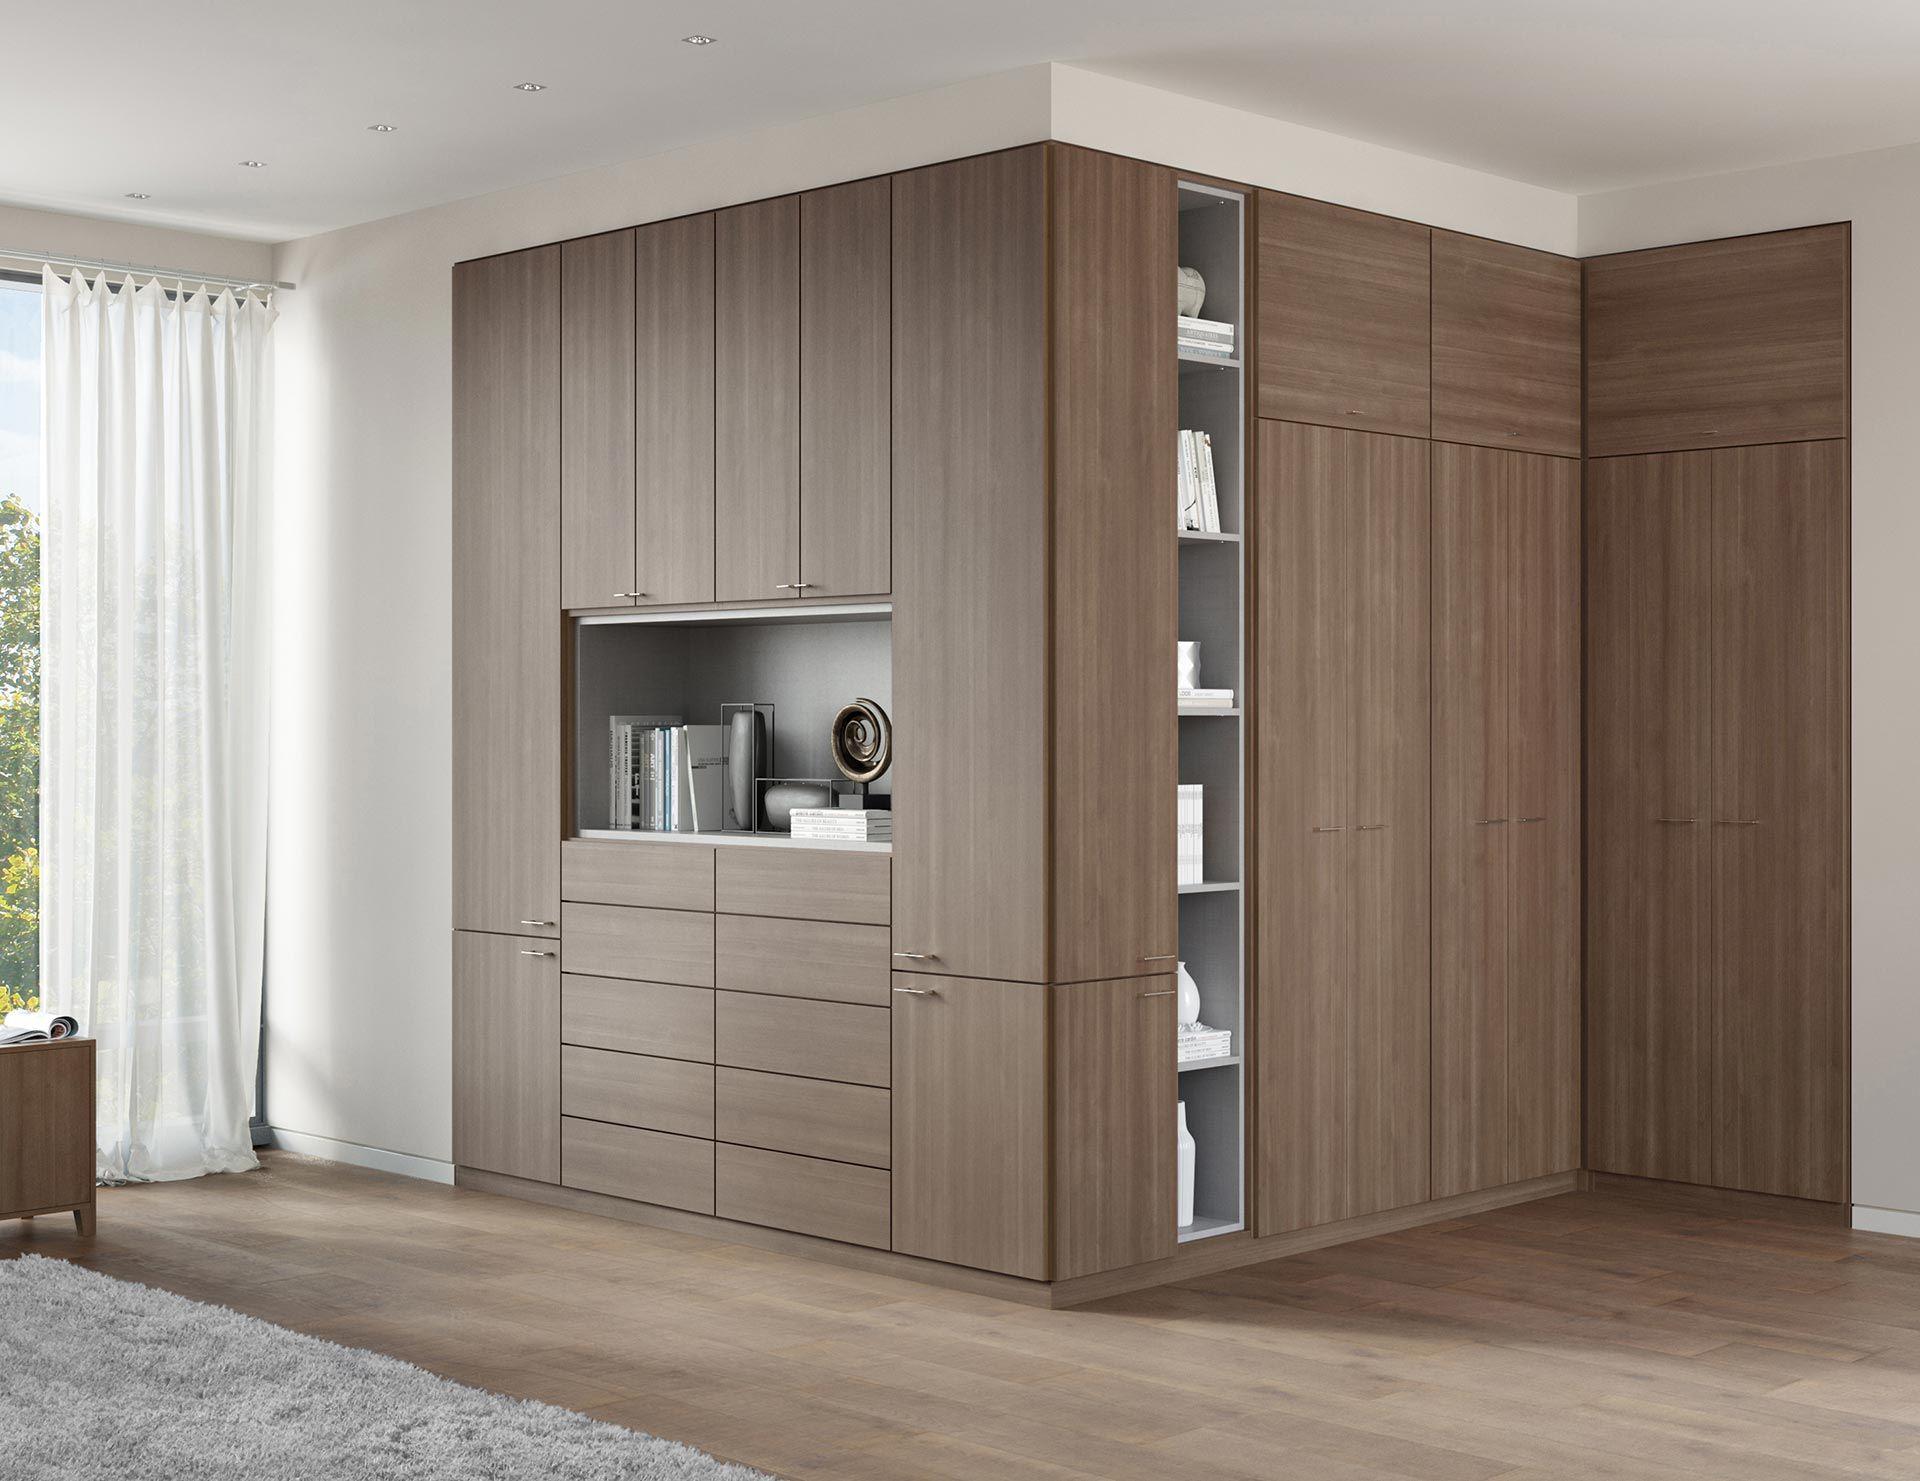 Wardrobe Closets Custom Closet Systems For Your Bedroom